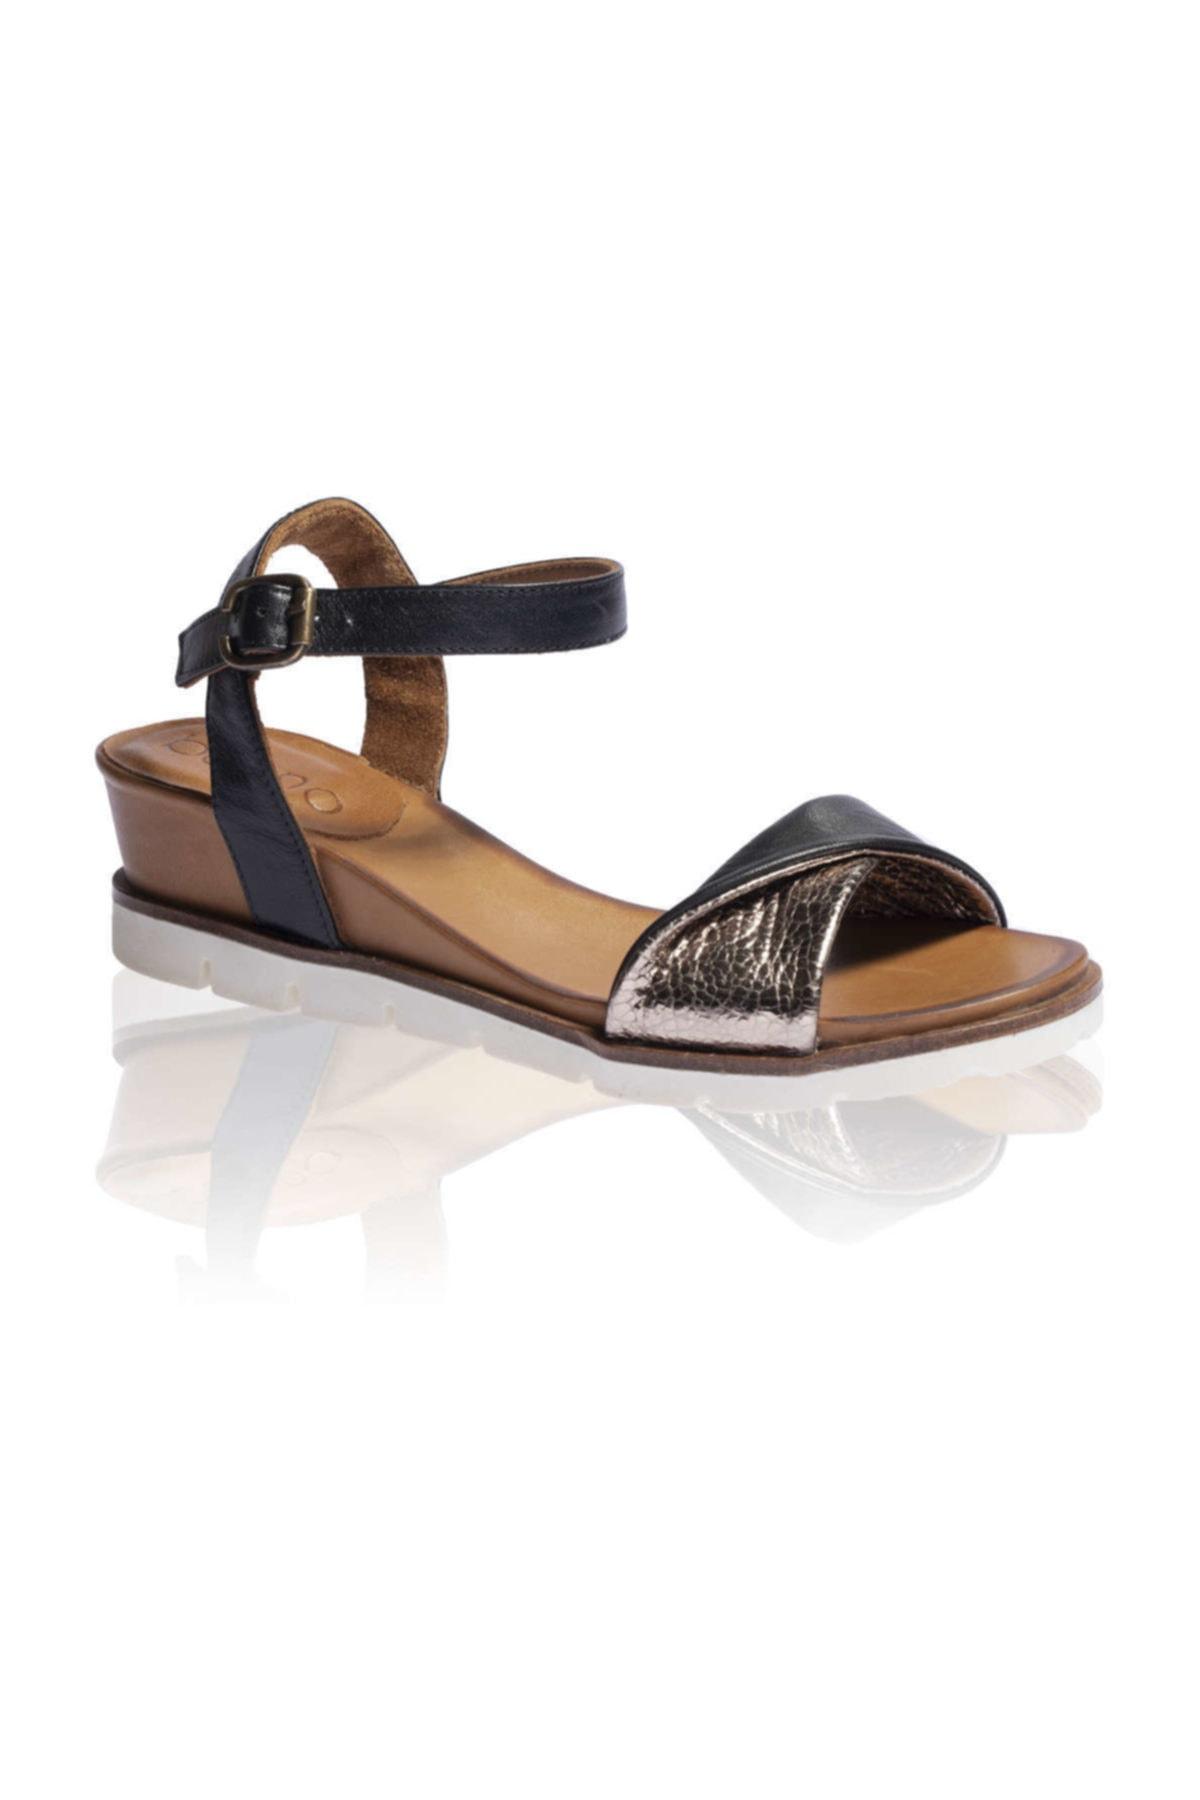 BUENO Shoes Taba Bayan Sandalet 9n2203 1